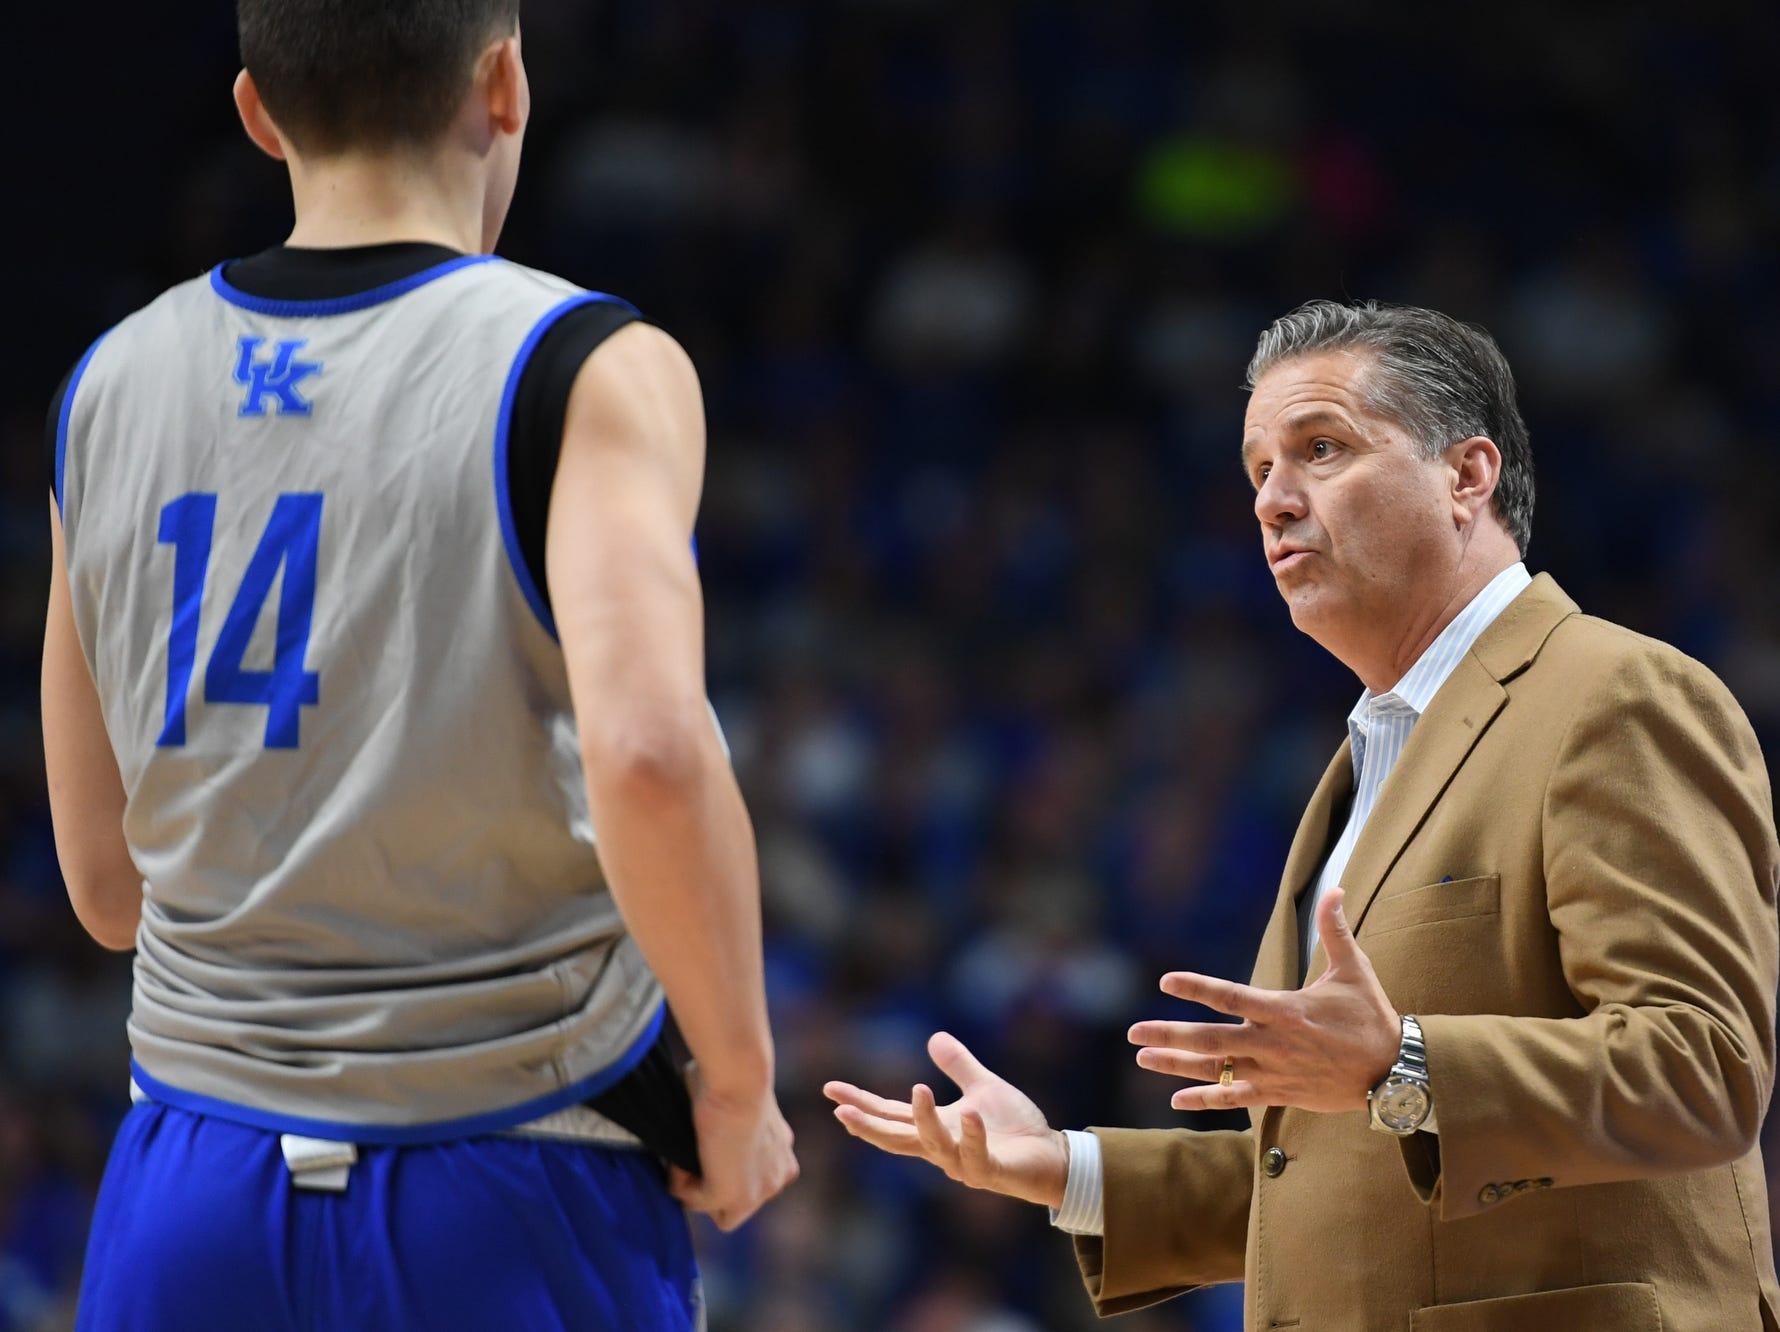 Uk Basketball: John Calipari: G League Contracts Will Make Kentucky